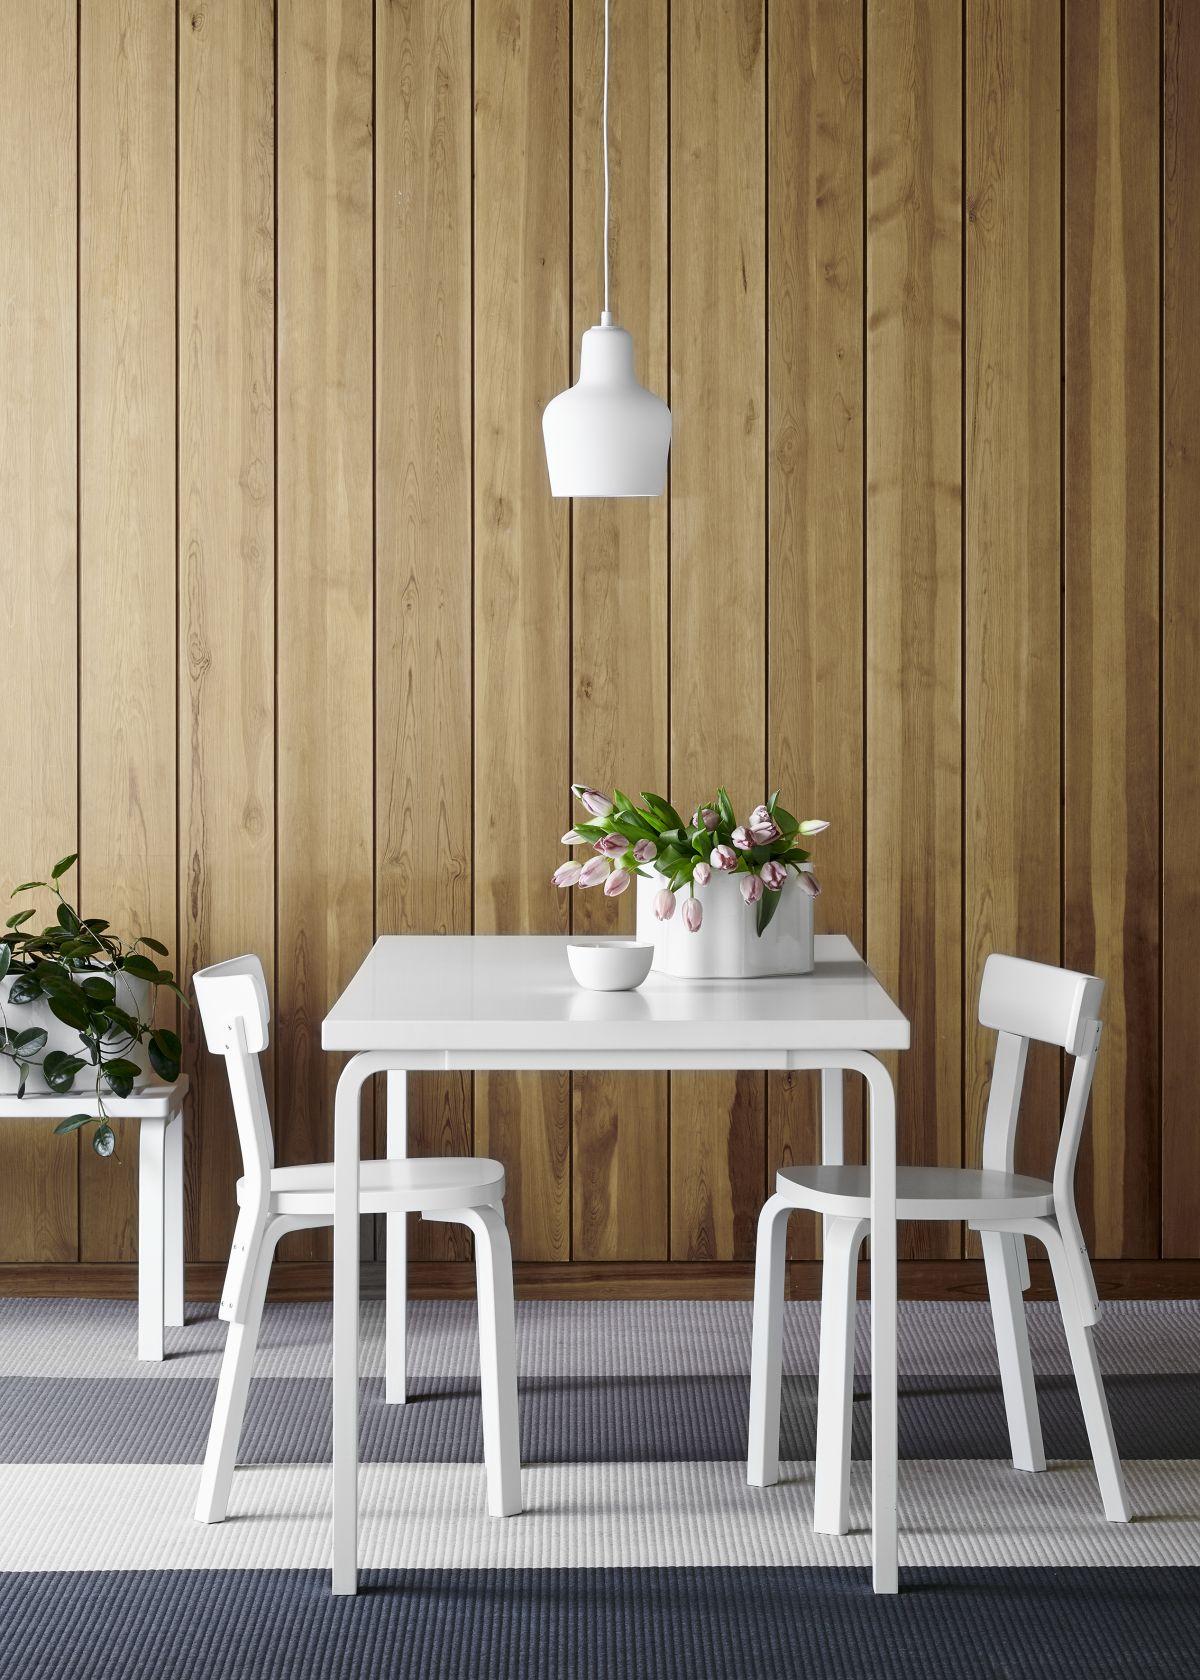 Chair_69_Aalto_Table_rectangular_82A_A440_white_lacquer_2